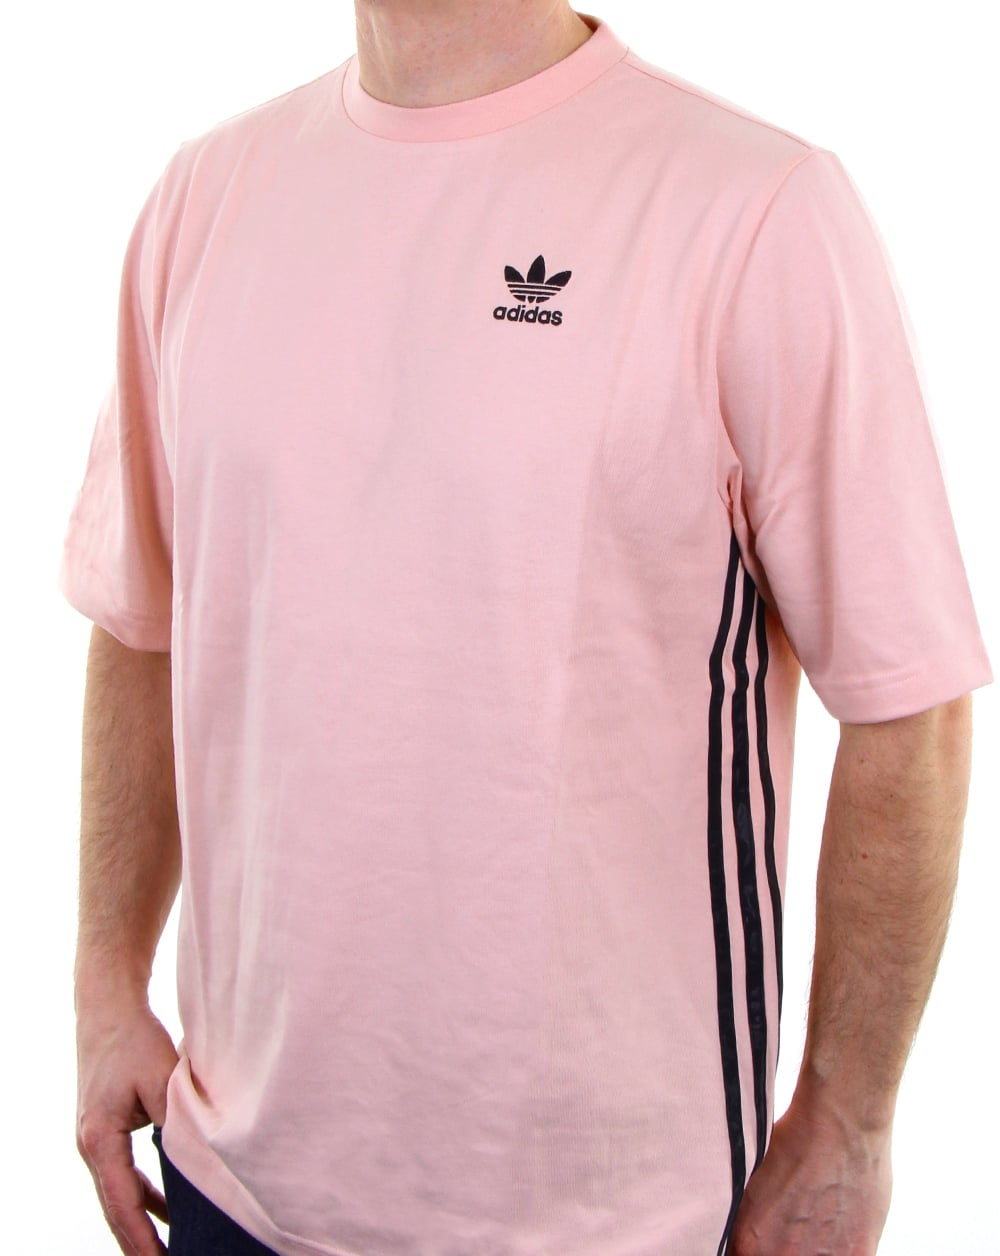 Boxy Vapor Shirt T Adidas Pink Ob Originals HCxqwXPTE